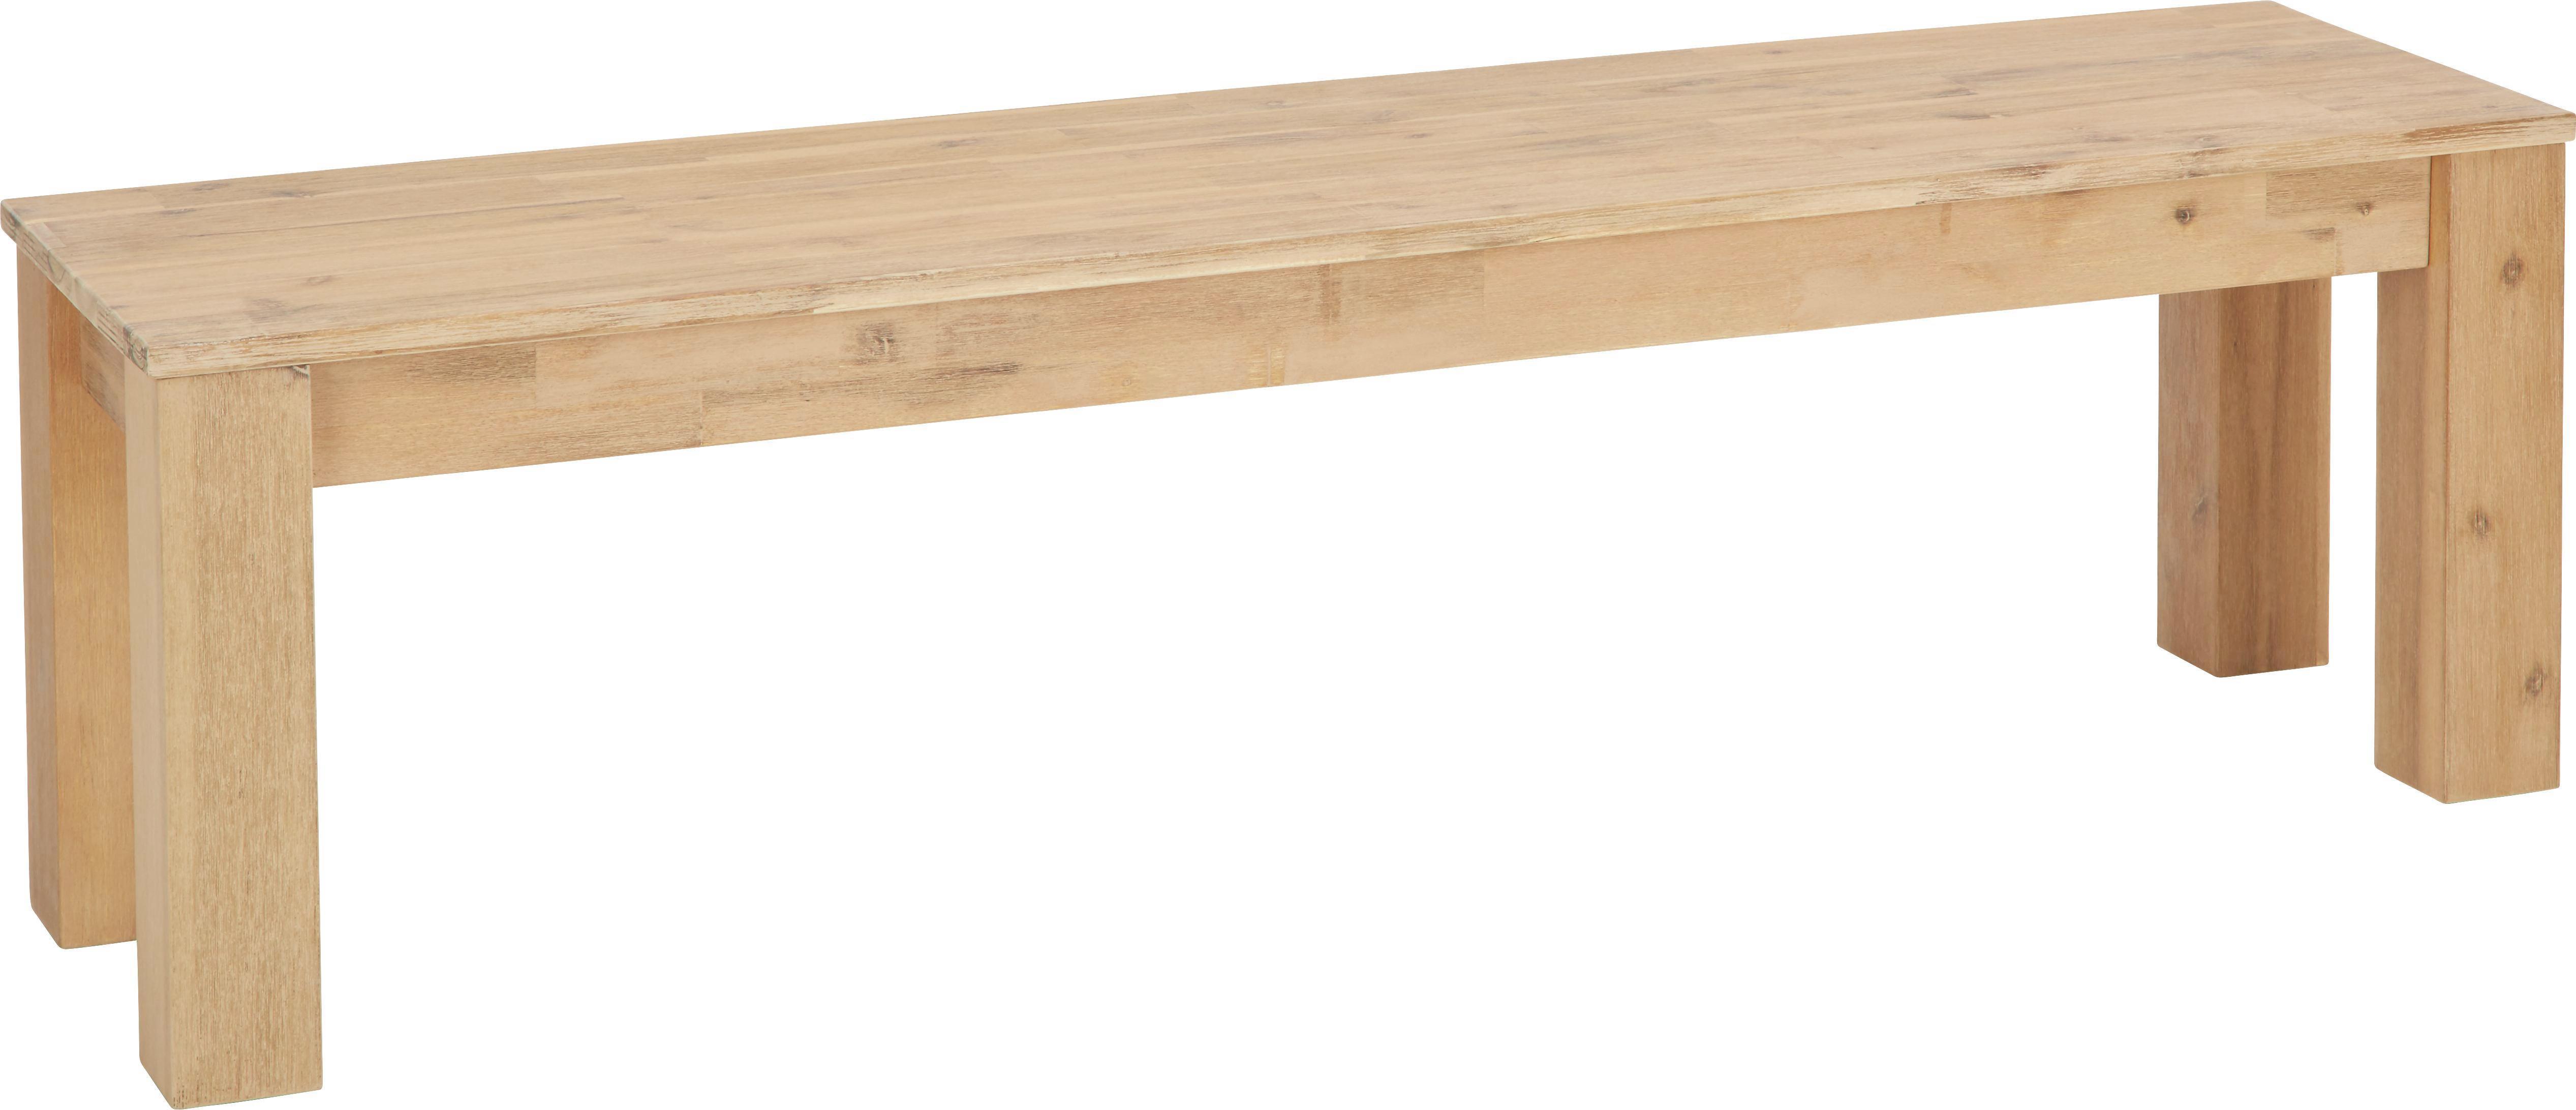 Sitzbank in Akazie aus Echtholz - Akaziefarben, KONVENTIONELL, Holz (160/45/40cm) - ZANDIARA